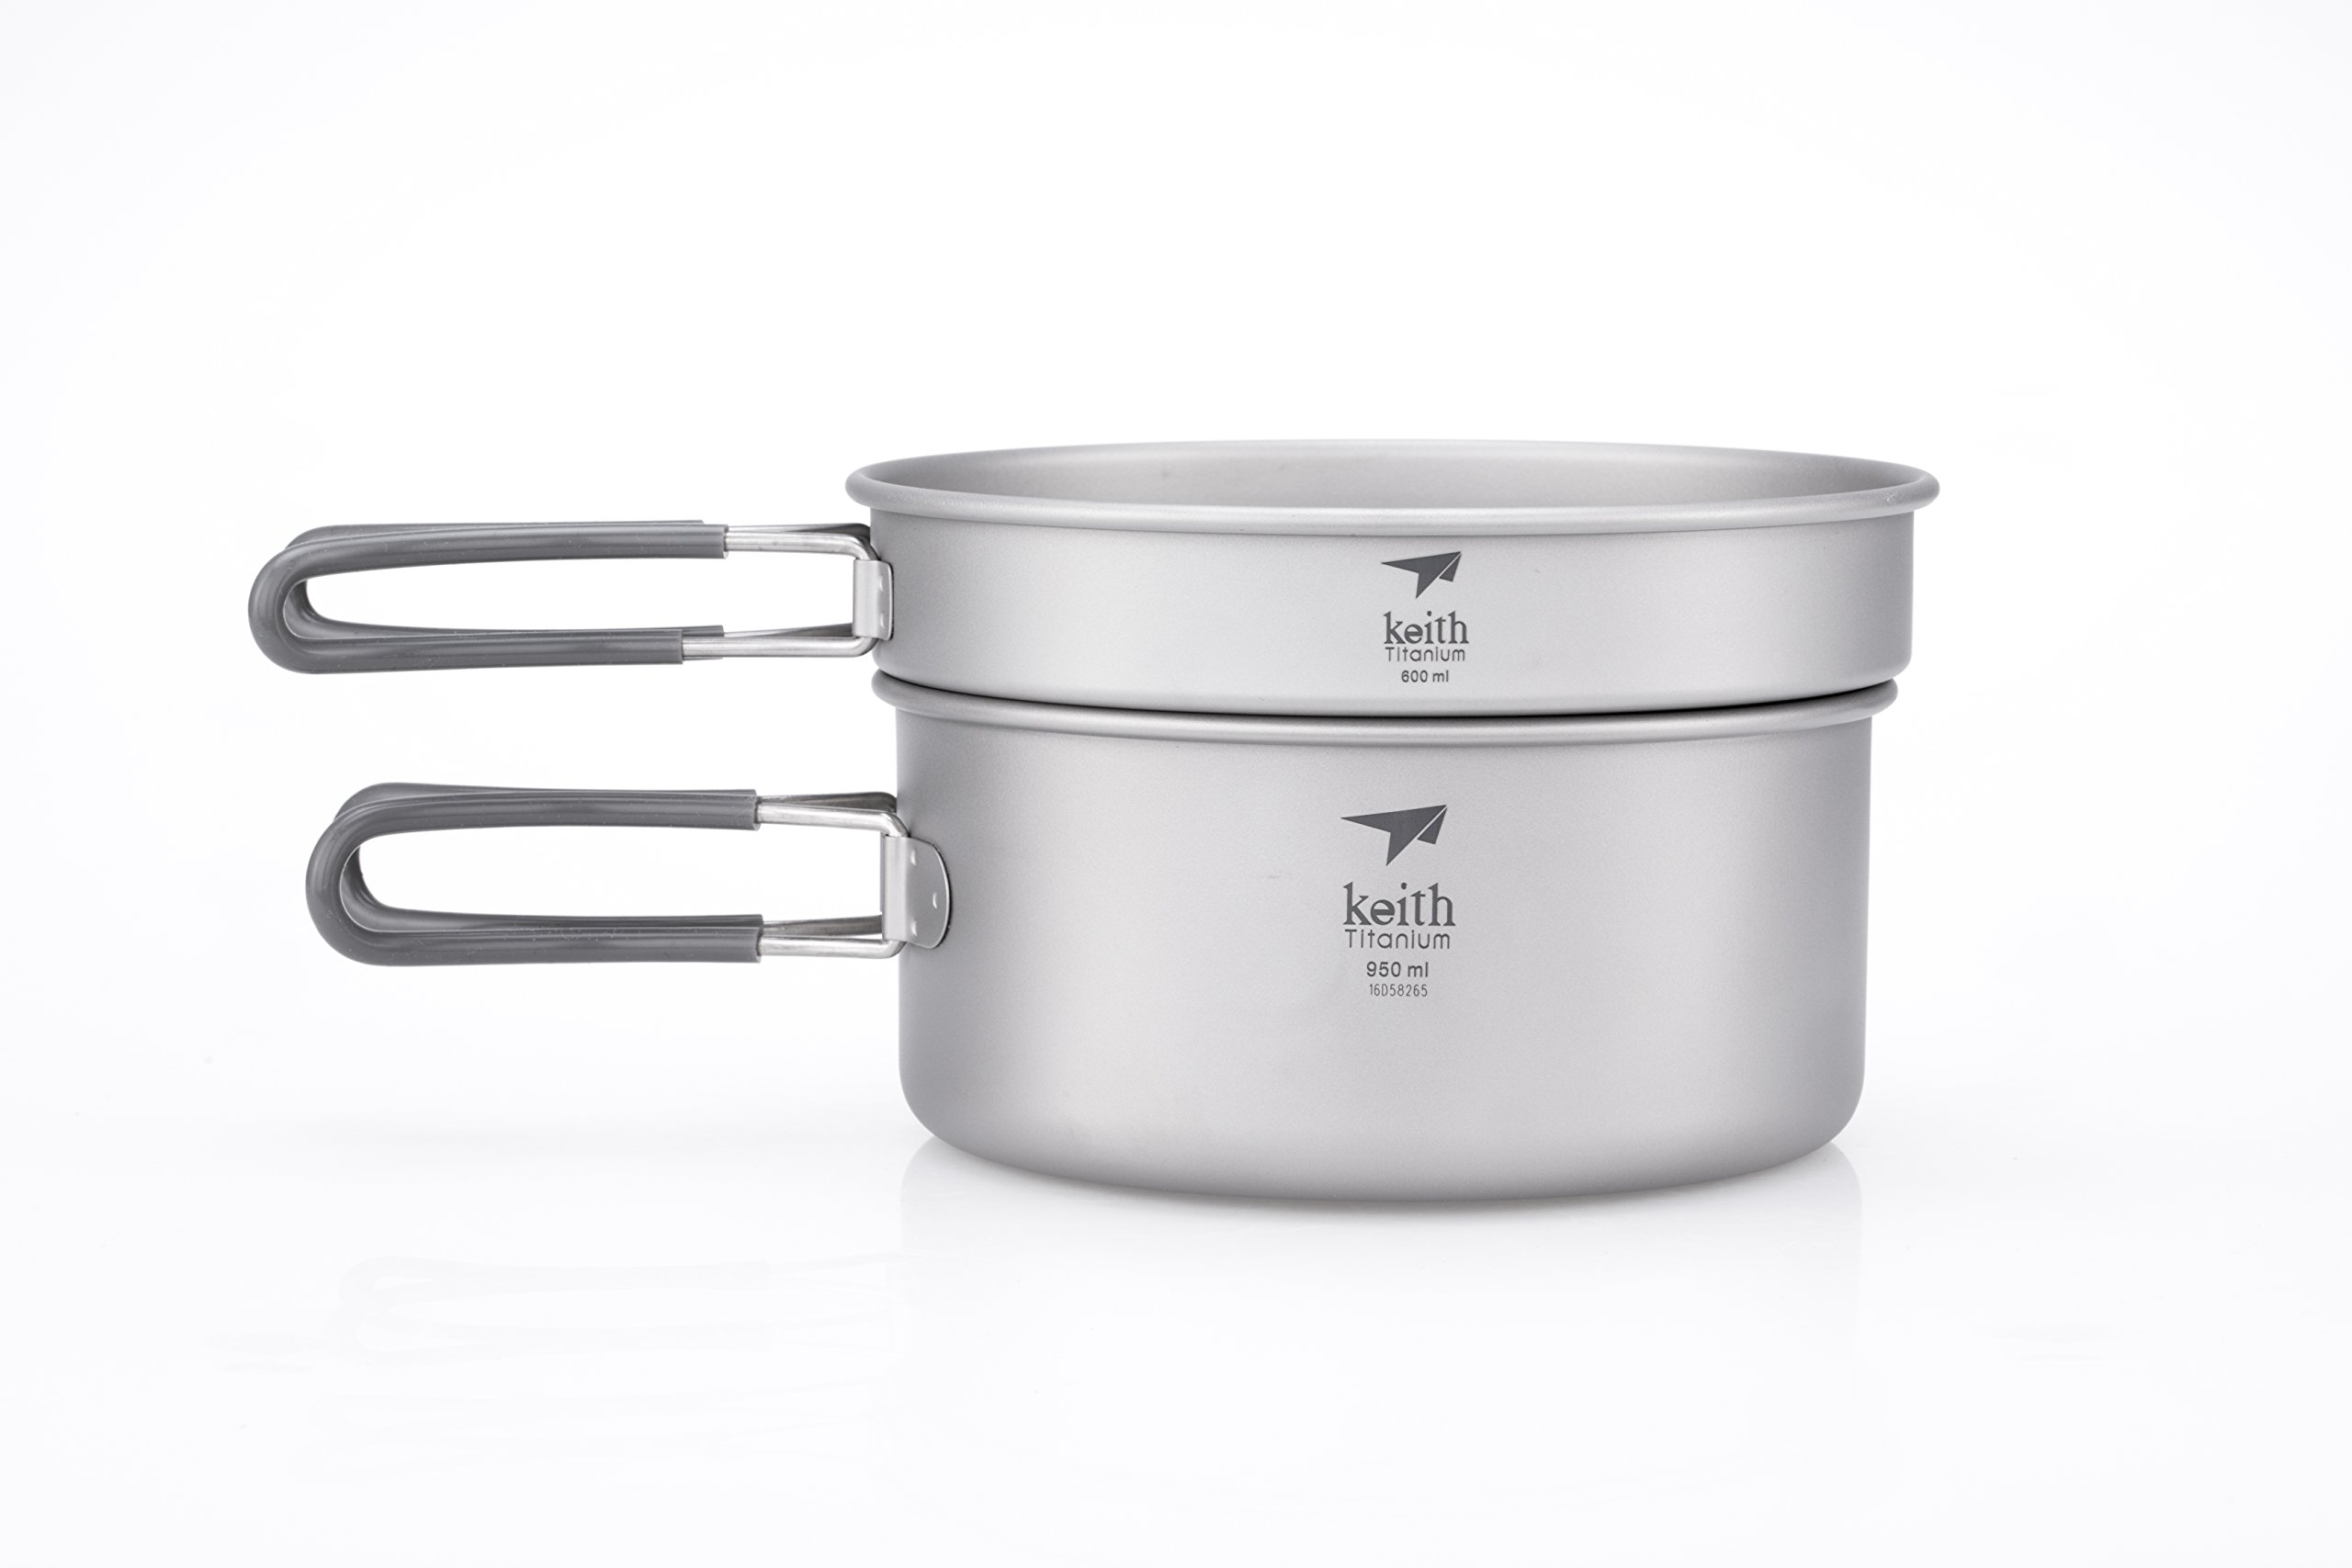 Keith Titanium Ti6016 2-Piece Pot and Pan Cook Set - 1.55 L (Limited Time Price) by Keith Titanium